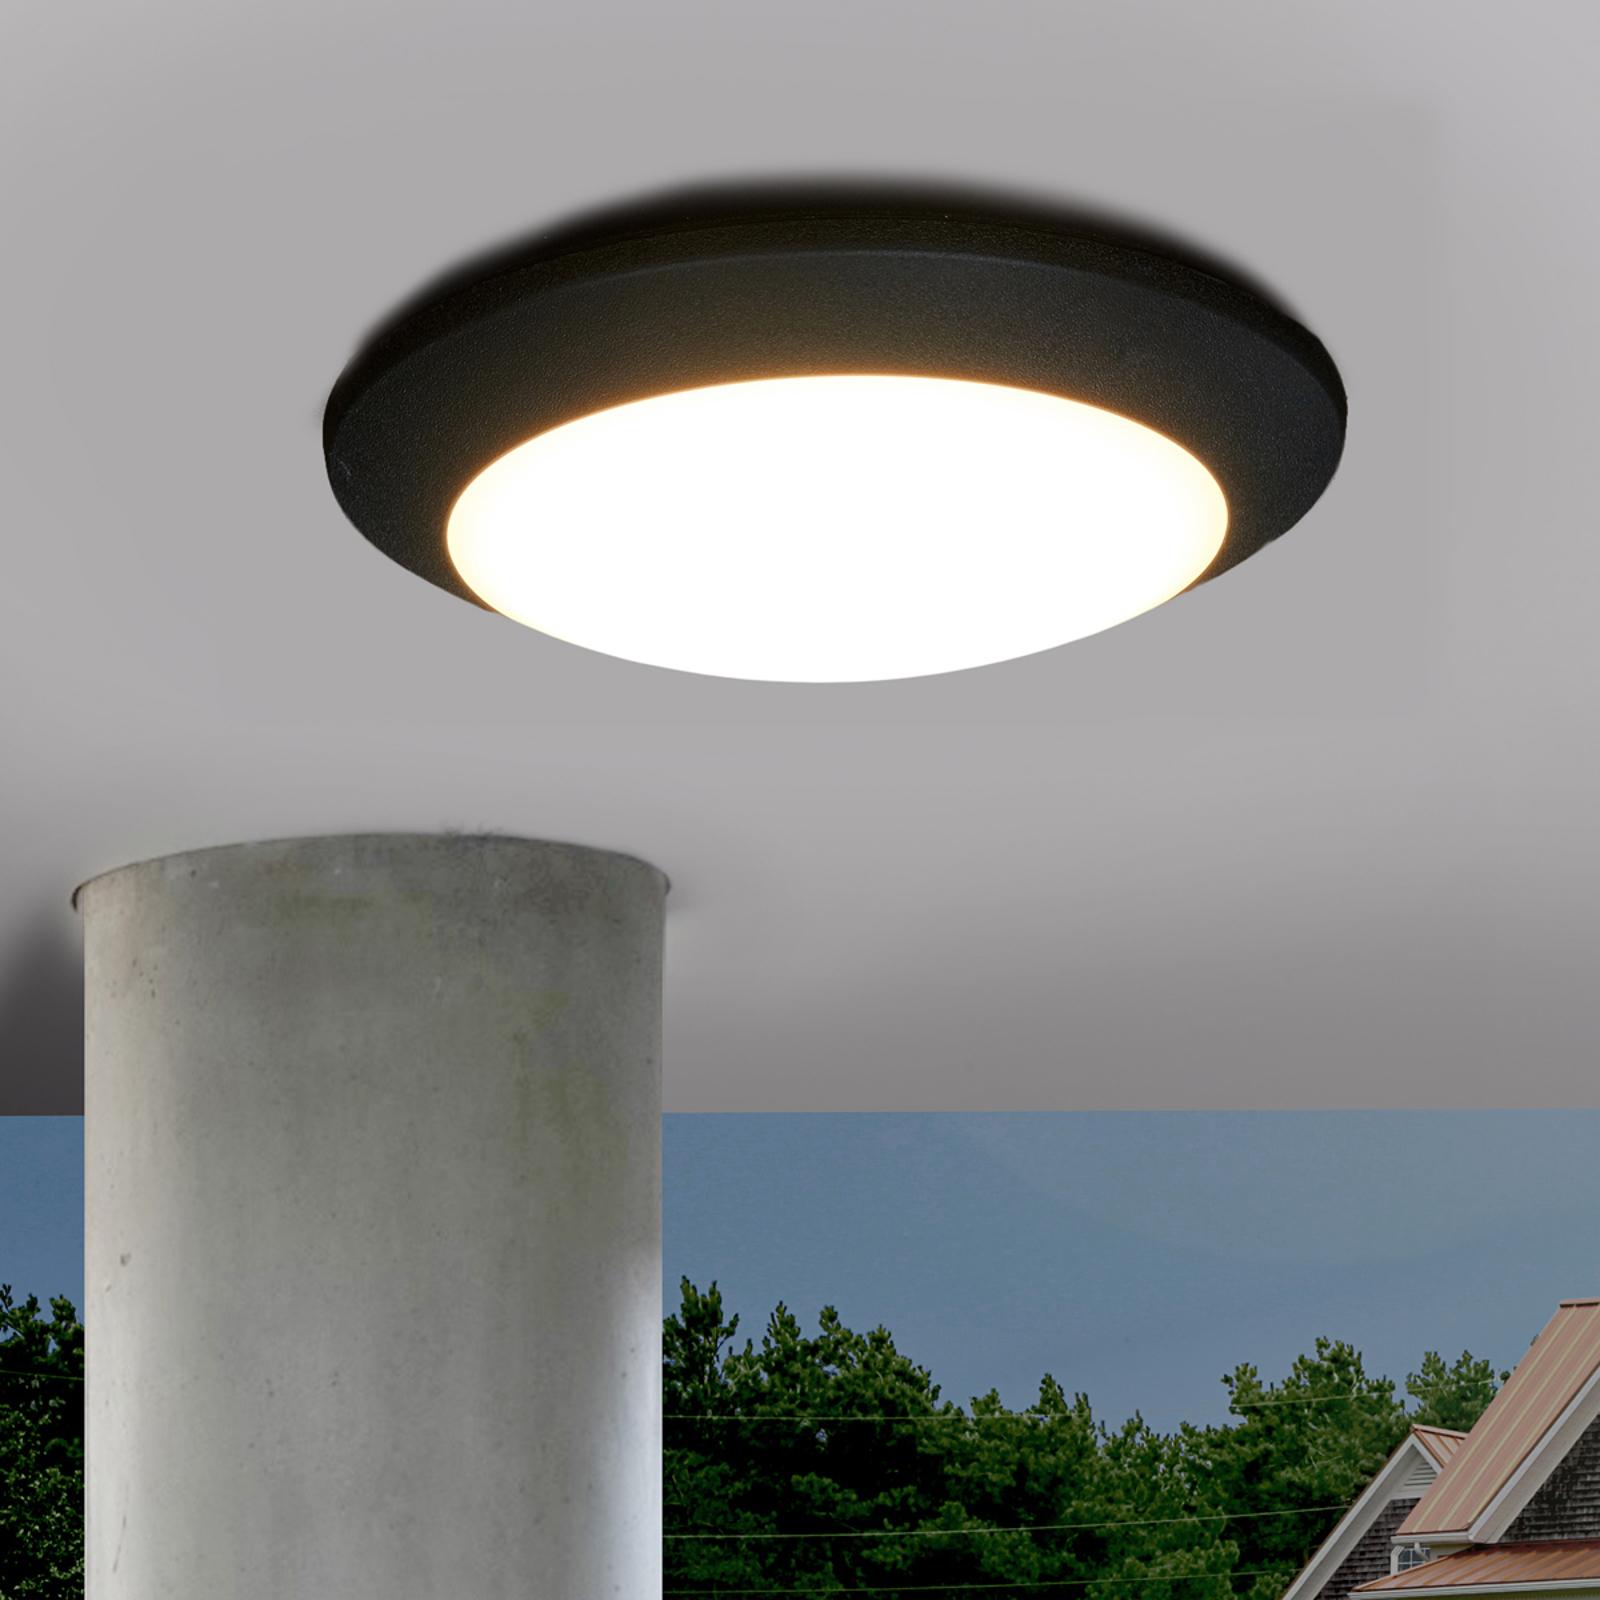 Berta-LED-ulkokattovalaisin, musta, 11 W, 3000 K